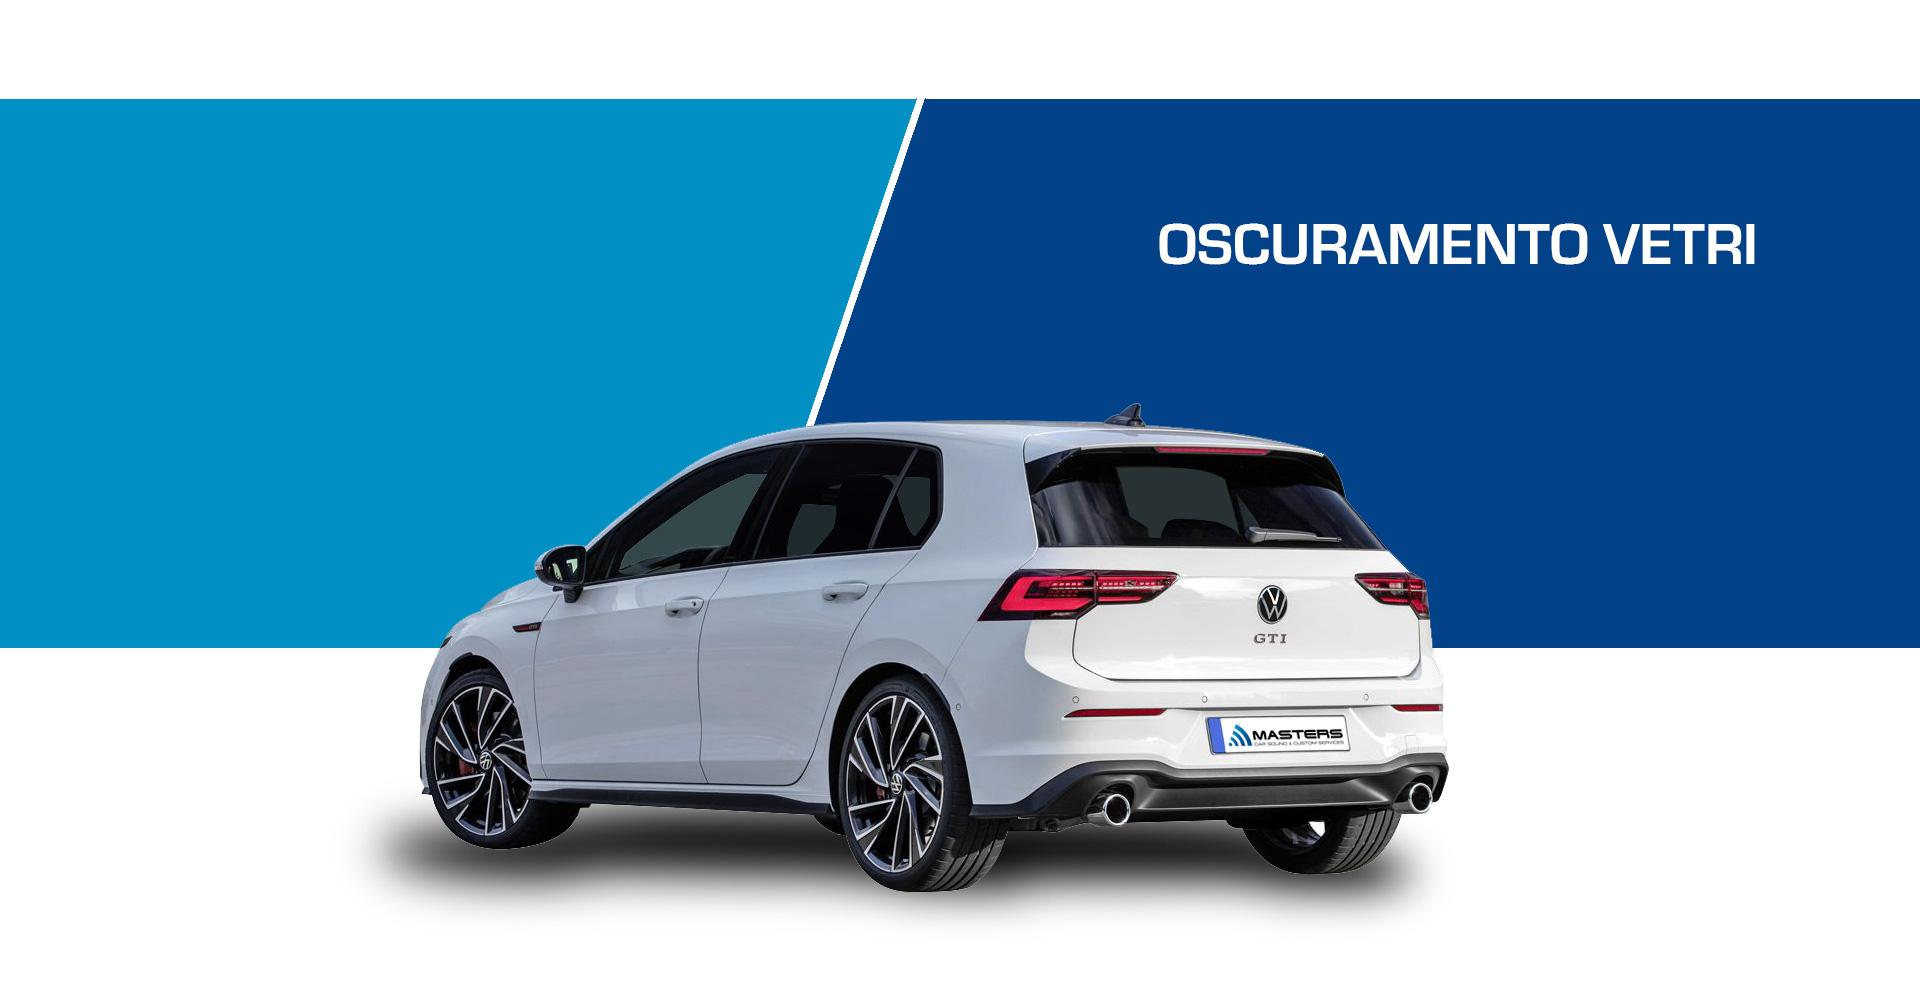 Oscuramento vetri Volkswagen Golf GTI 2020